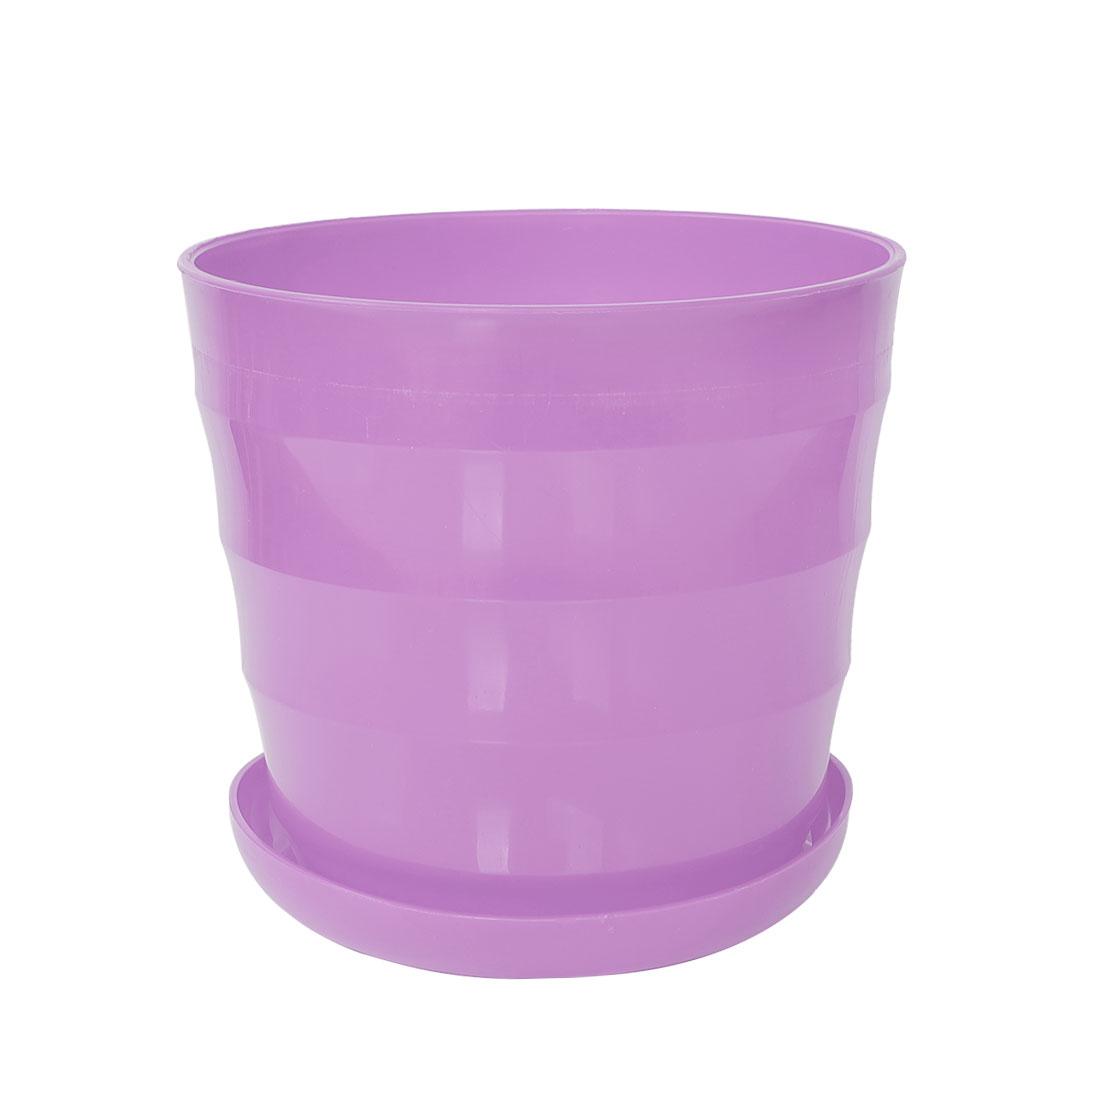 Home Balcony Office Plastic Round Plant Planter Holder Flower Pot Purple 19cm Dia